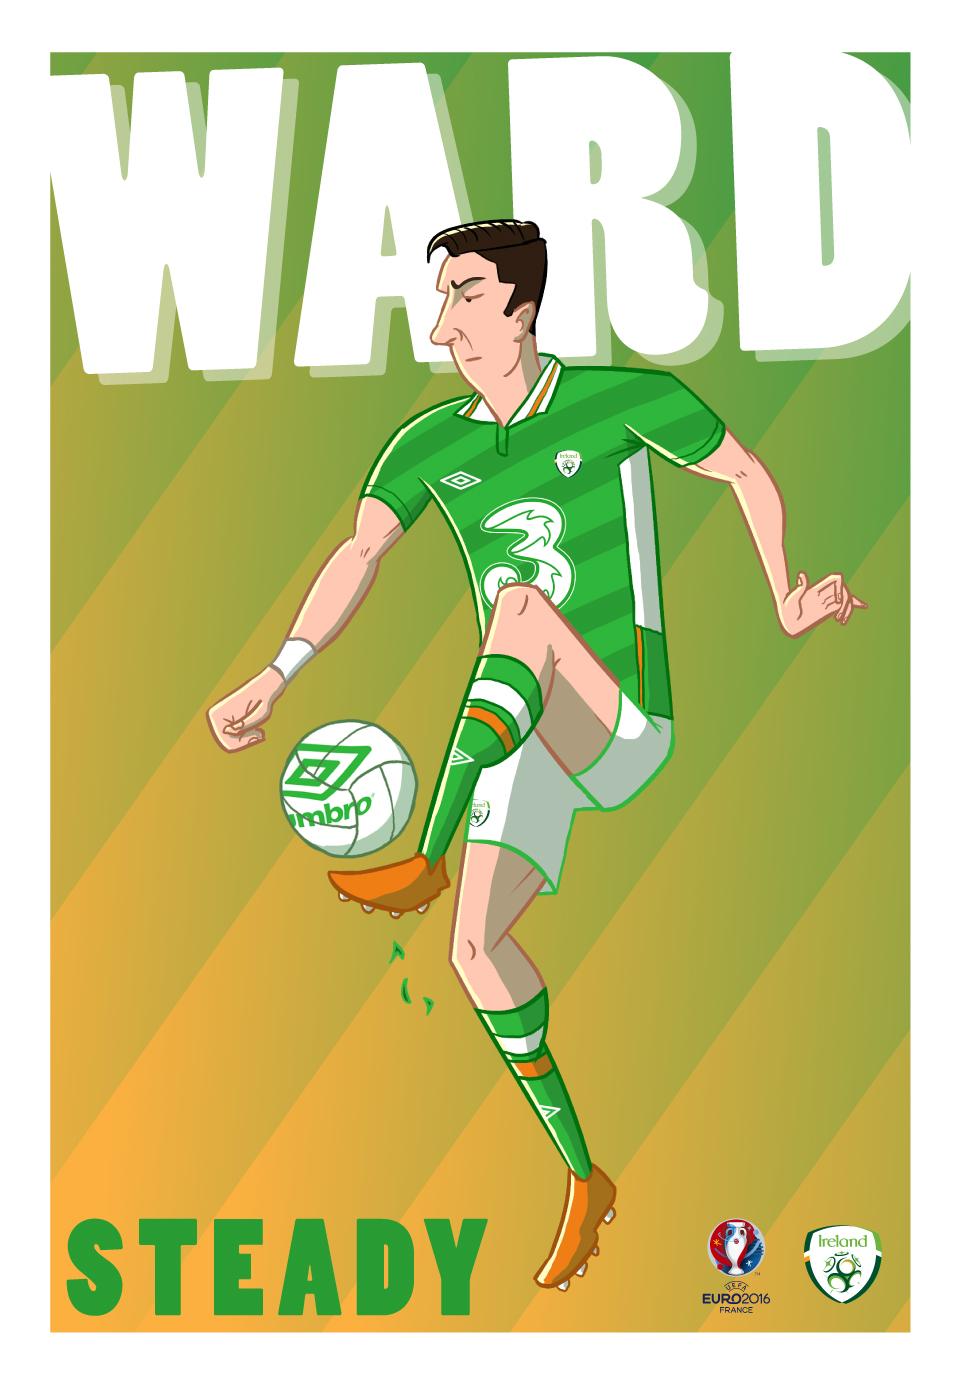 Stephen-Ward-1.jpg